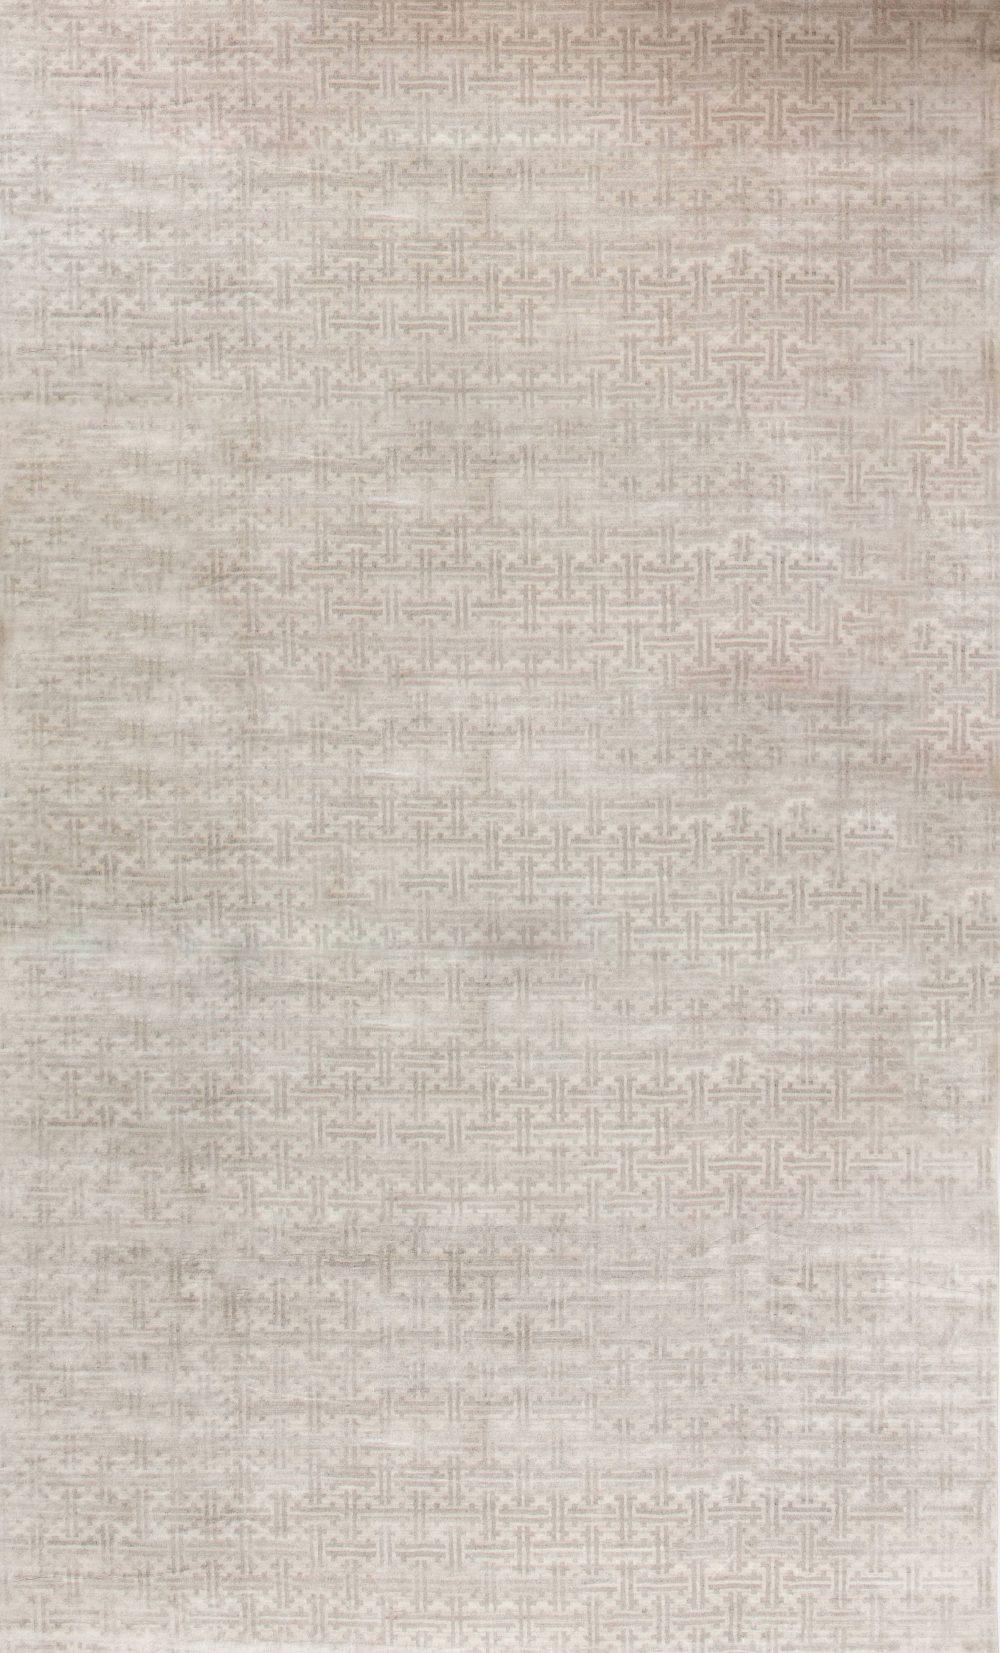 Oversized Natural Wool Rug N11360